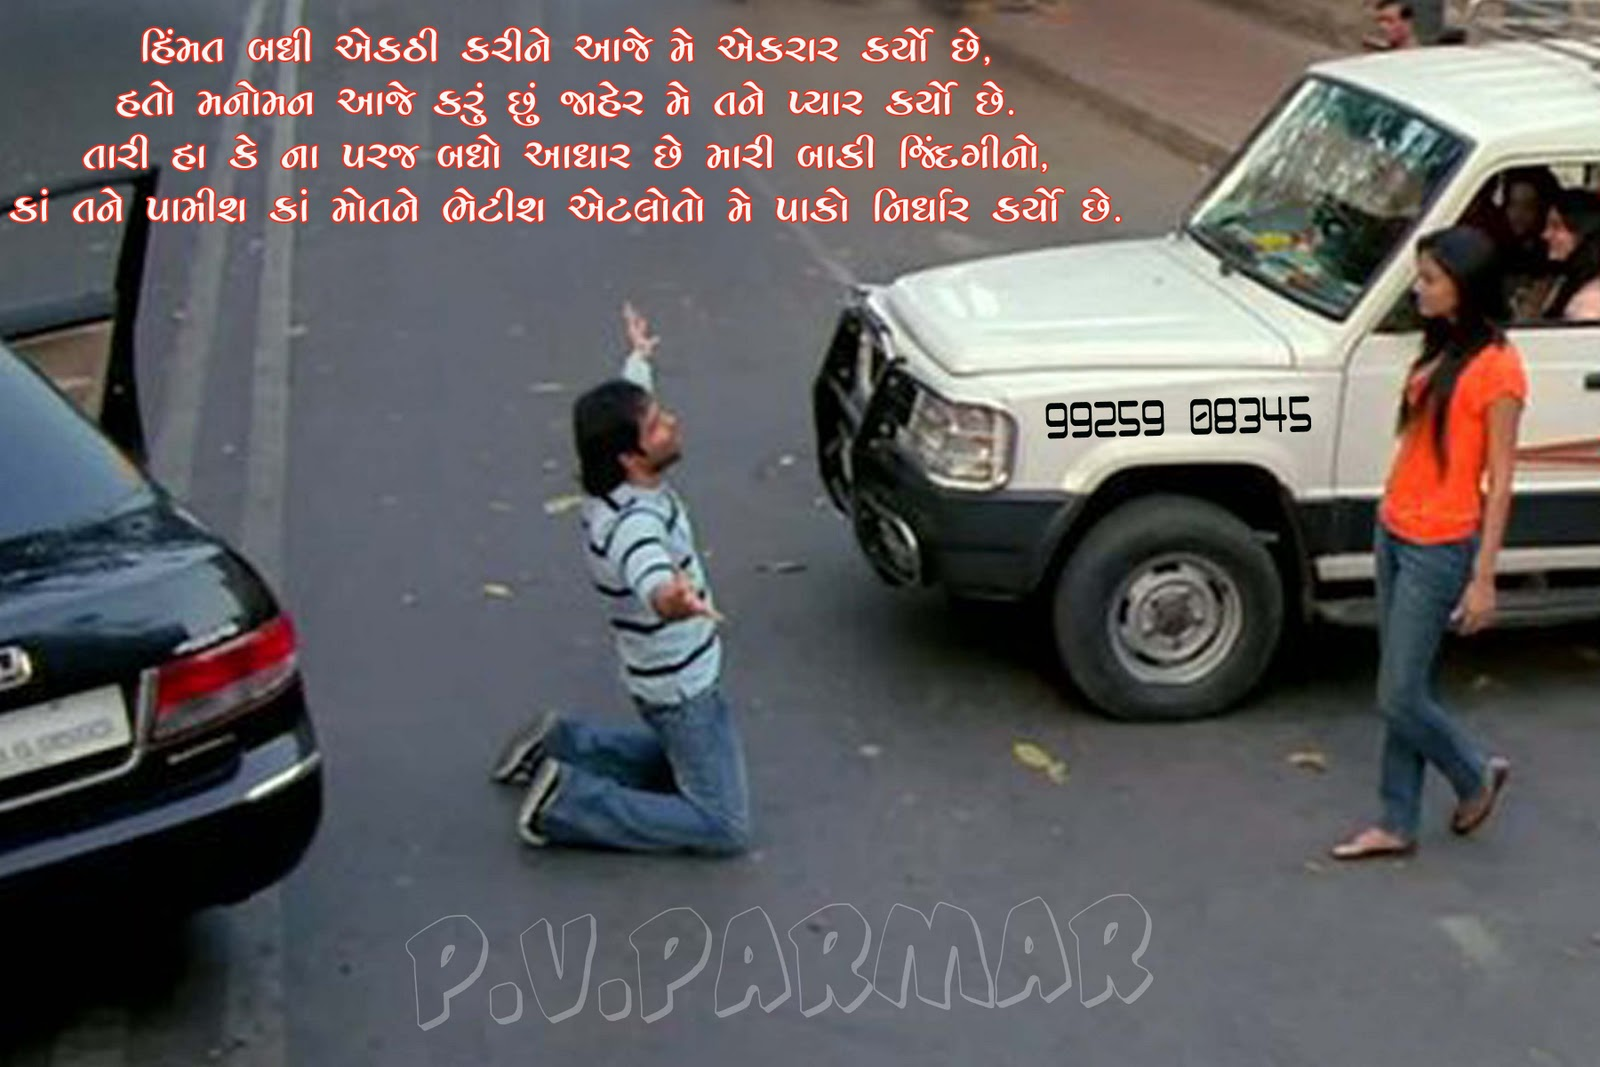 http://1.bp.blogspot.com/-UE5IDgjqwW8/TuBPYskSCoI/AAAAAAAAAQc/xbuqU8qdomU/s1600/saurashtranoshayar.blogspot.com.jpg